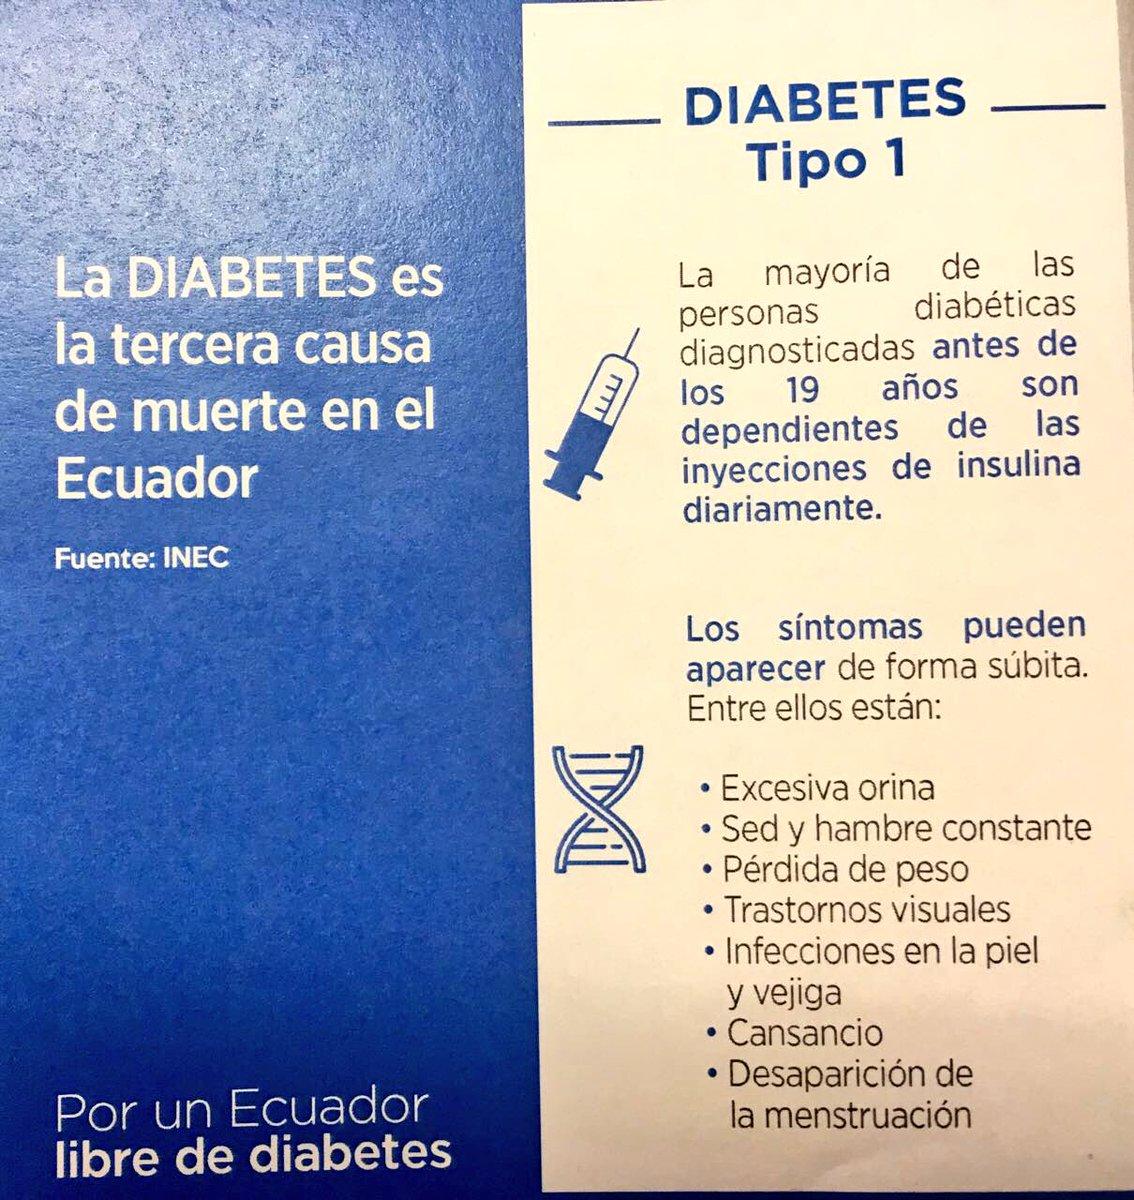 RT @MarianoEsManabi: Sabes quué es diabetes tipo 1? #DíaMundialDiabetes https://t.co/Qyz5BnL5n4